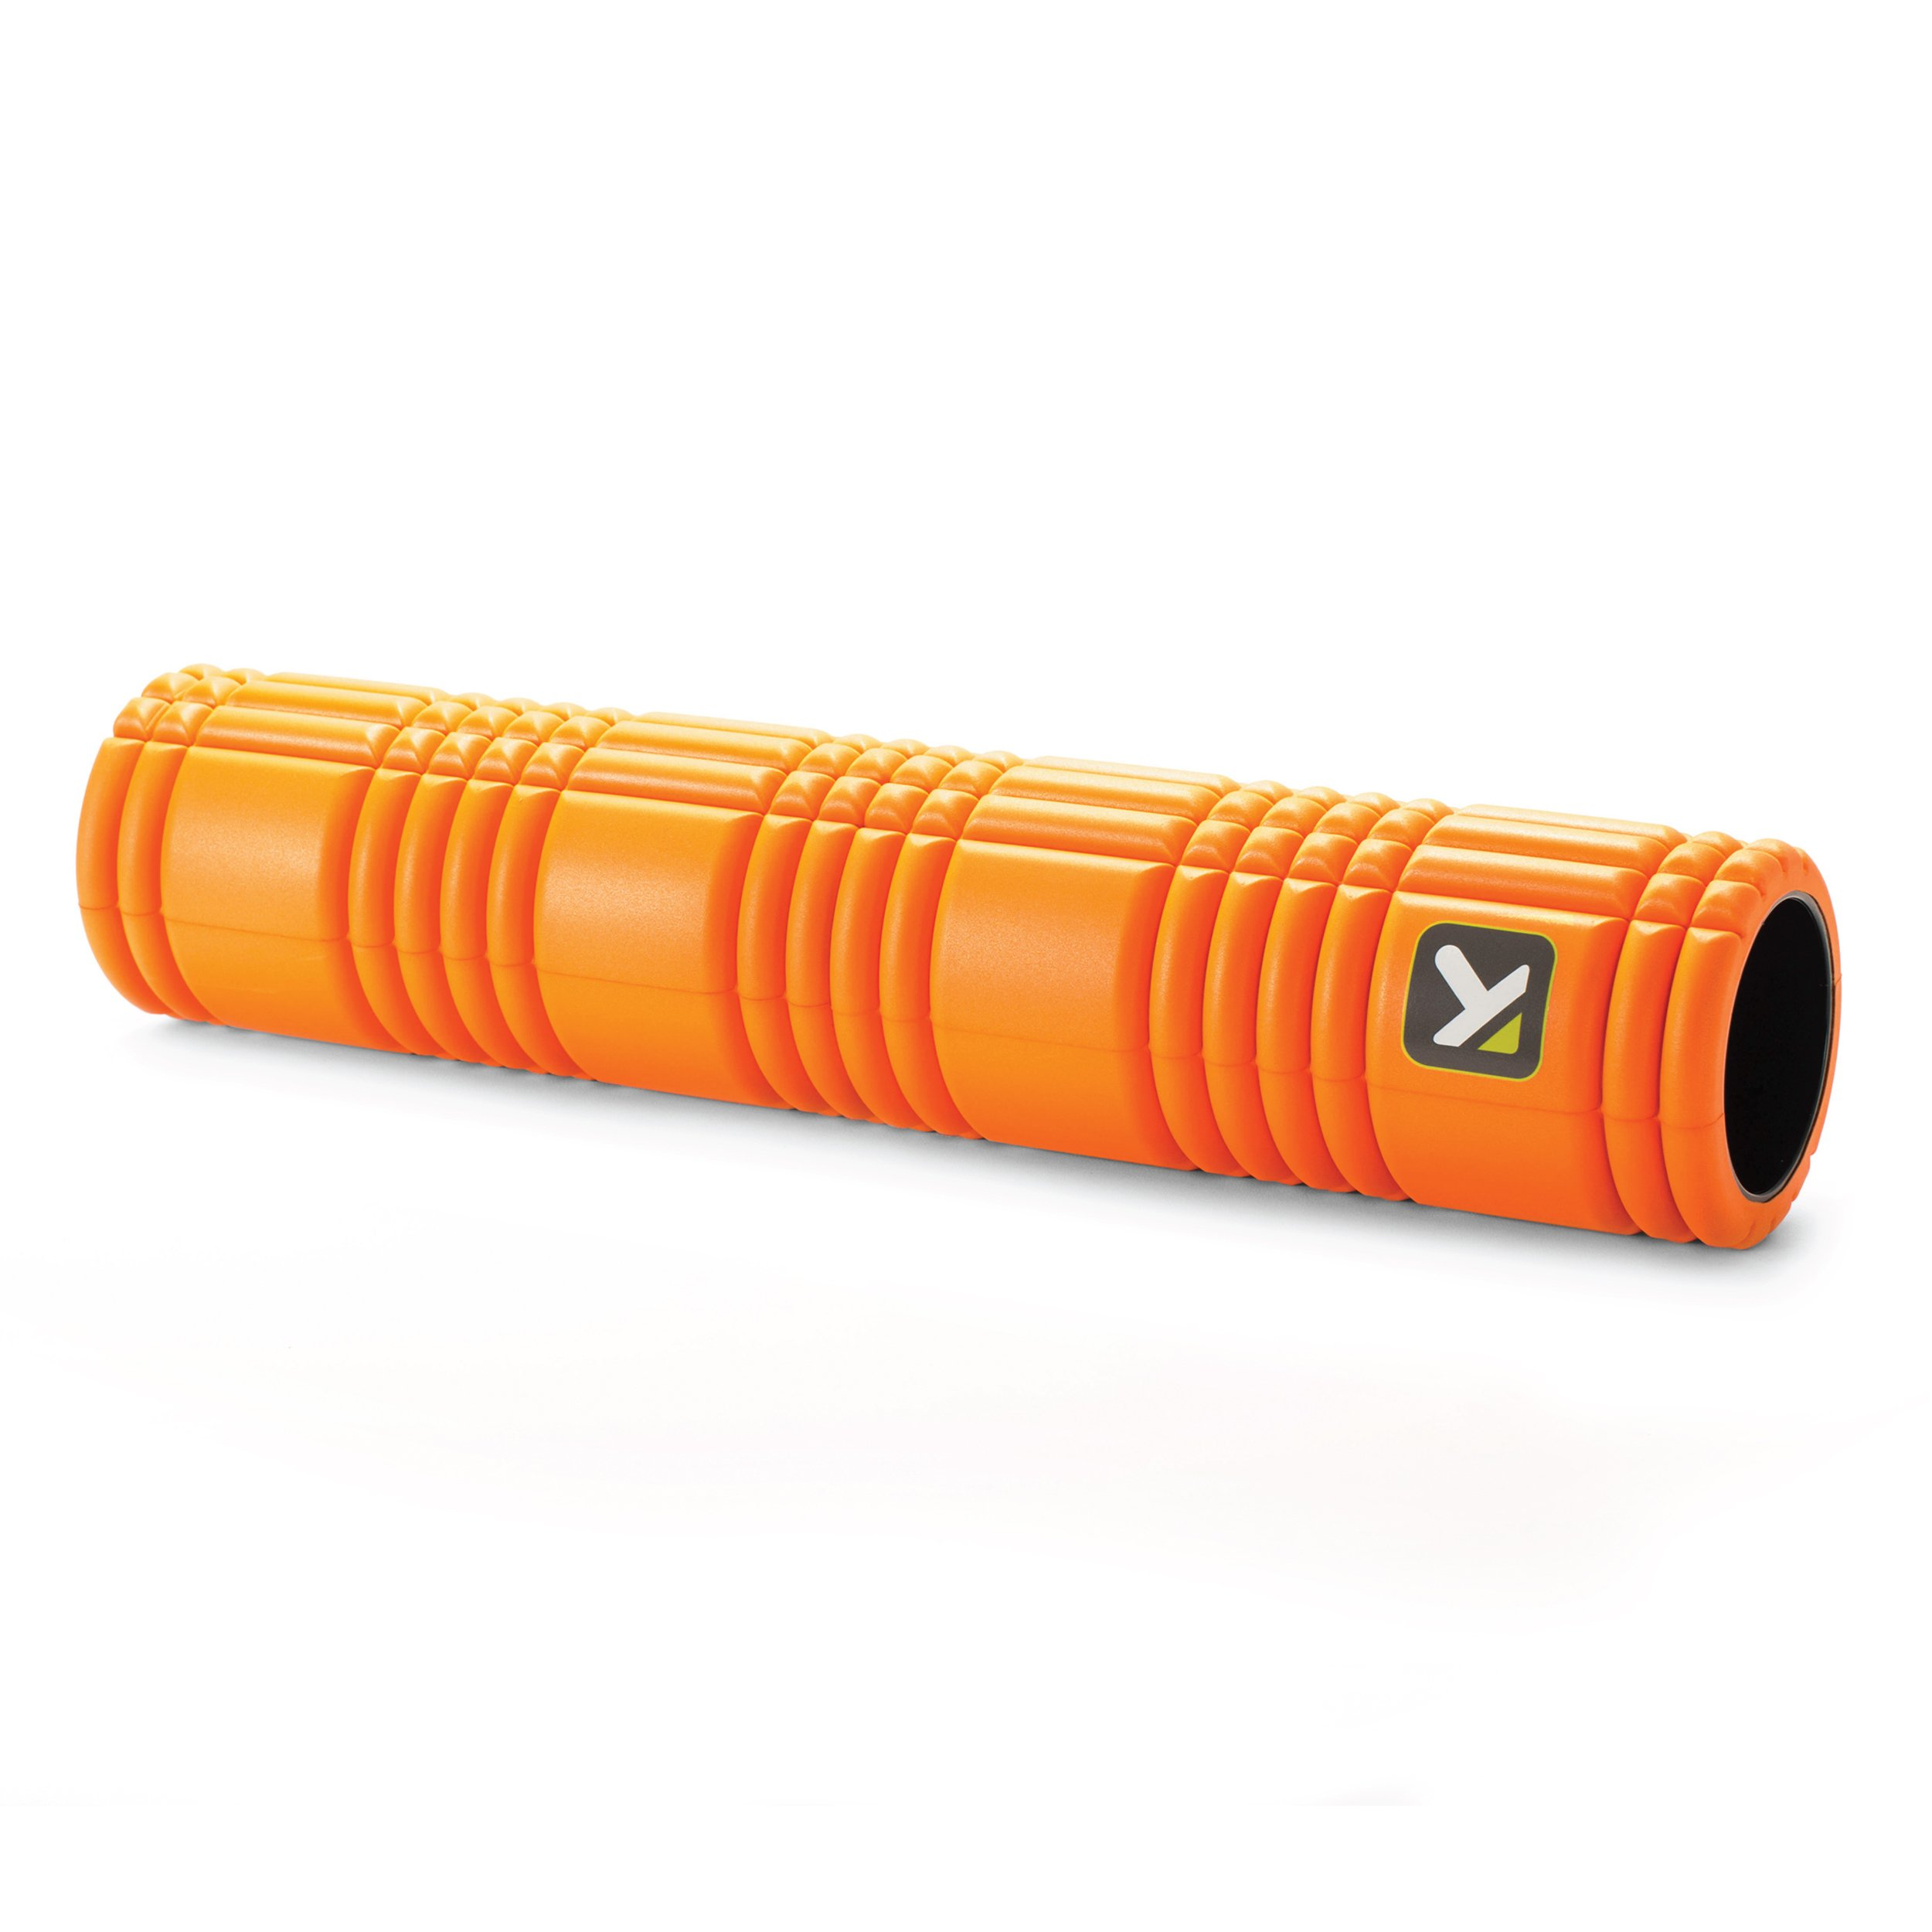 TriggerPoint Roller Online Instructional 26 inch